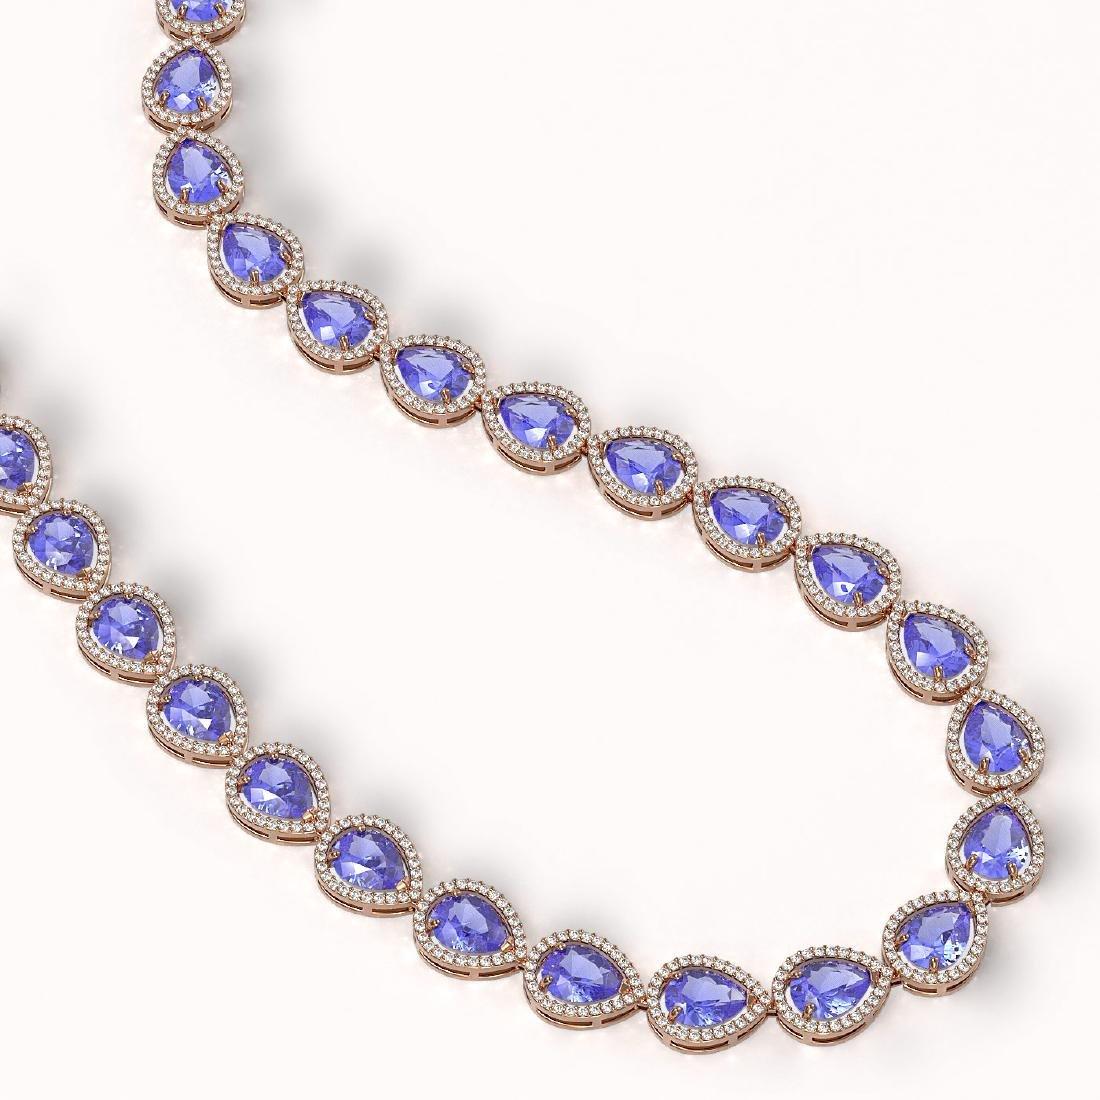 44.8 CTW Tanzanite & Diamond Halo Necklace 10K Rose - 2